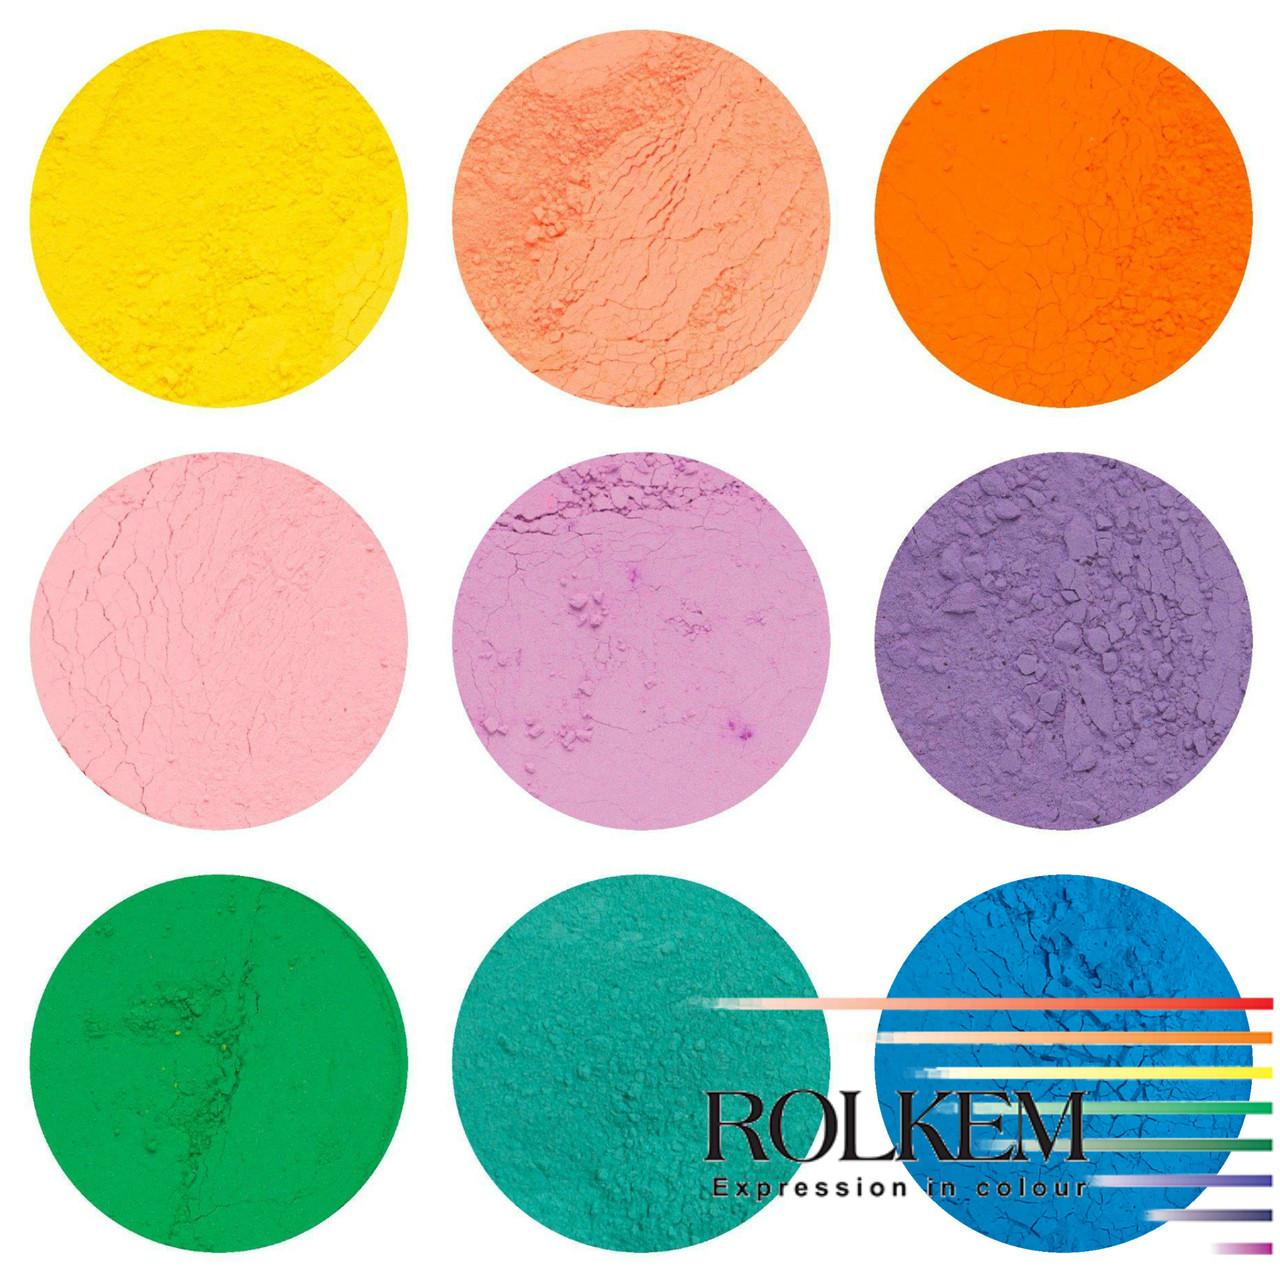 Roklem Rainbow Specturm 10ml   Food colouring dust for buttercream ...